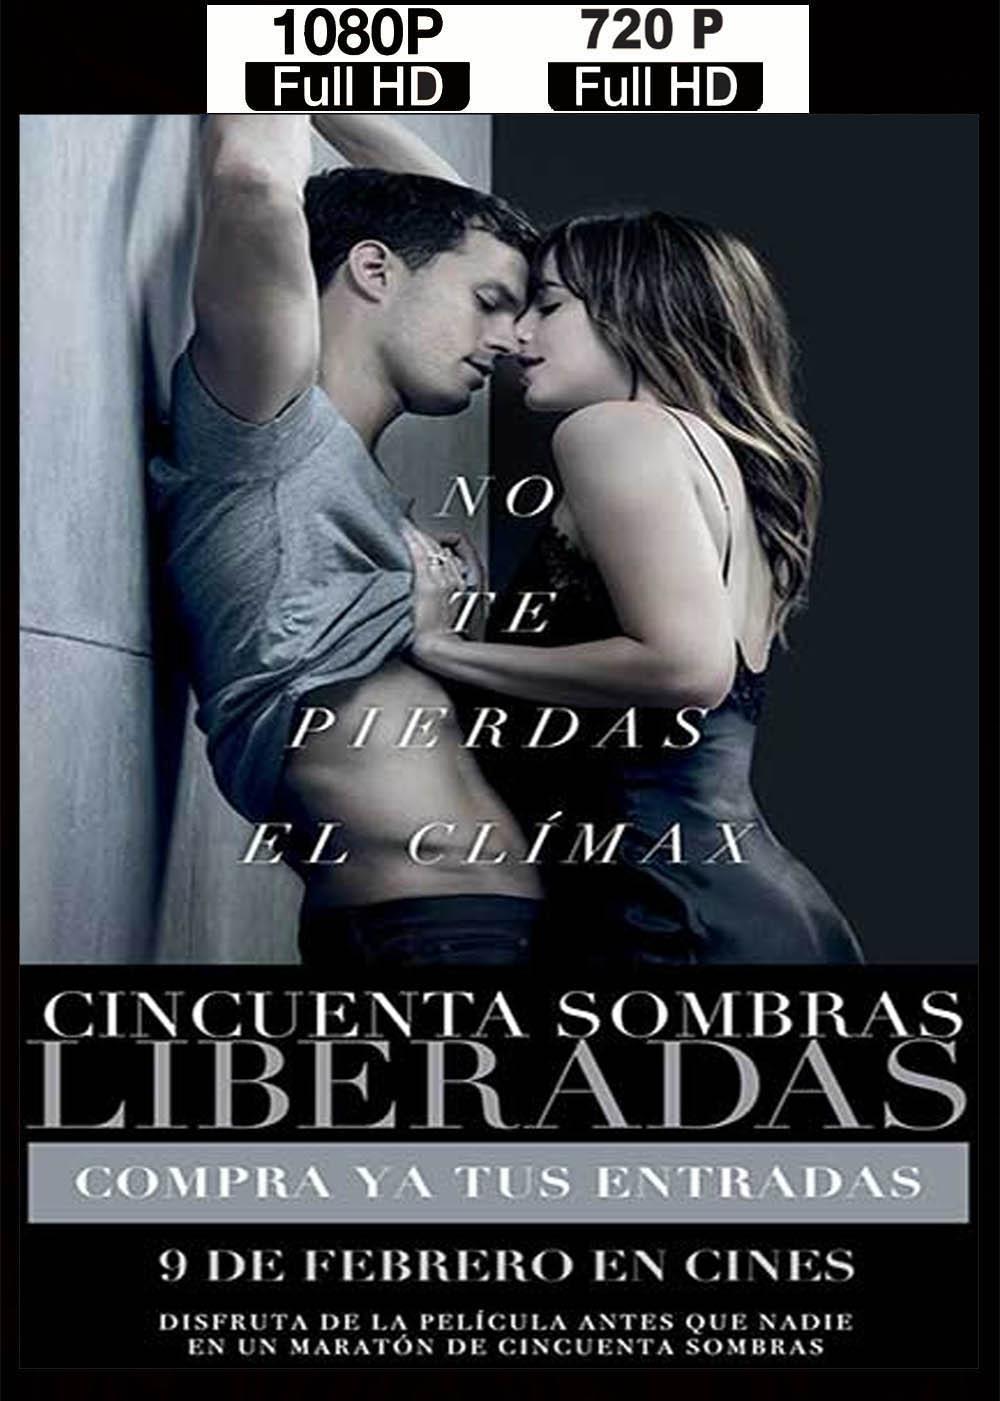 Cincuenta Sombras Liberadas 2018 Hd 1080p 720p Latino